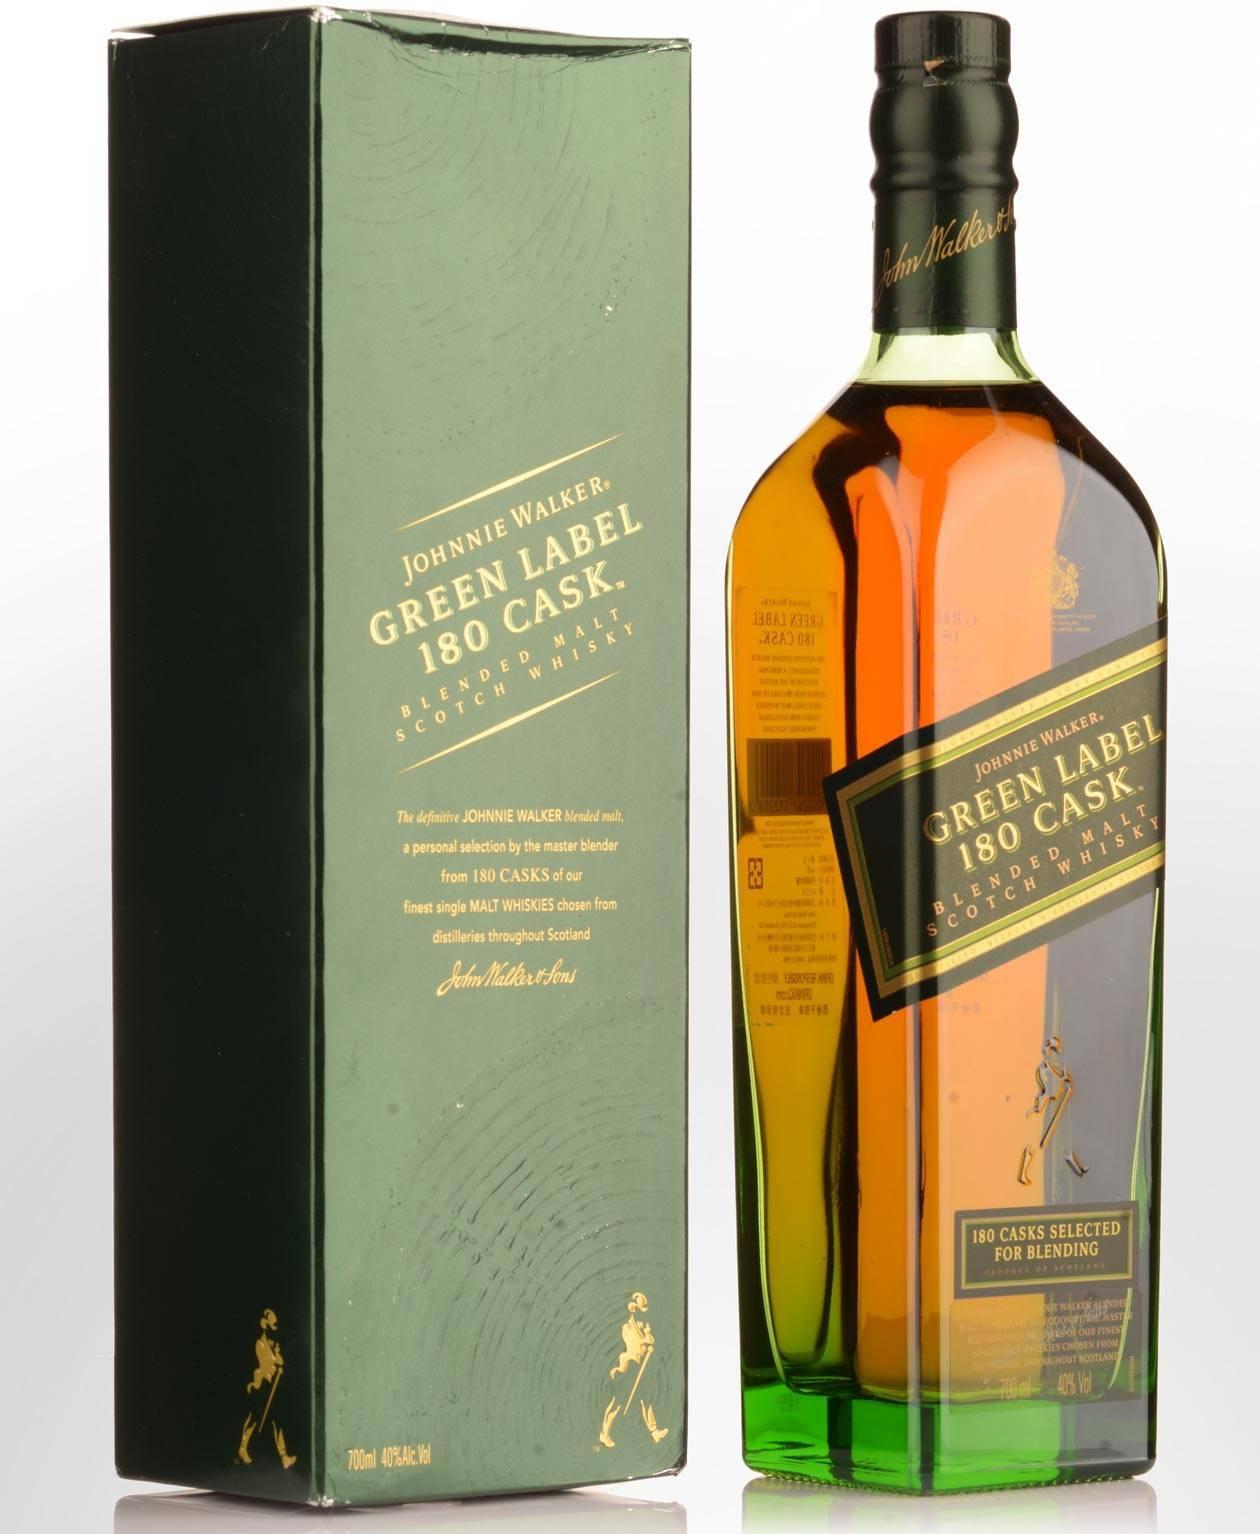 Виски johnnie walker blue label (джонни уокер блю лейбл) и его особенности